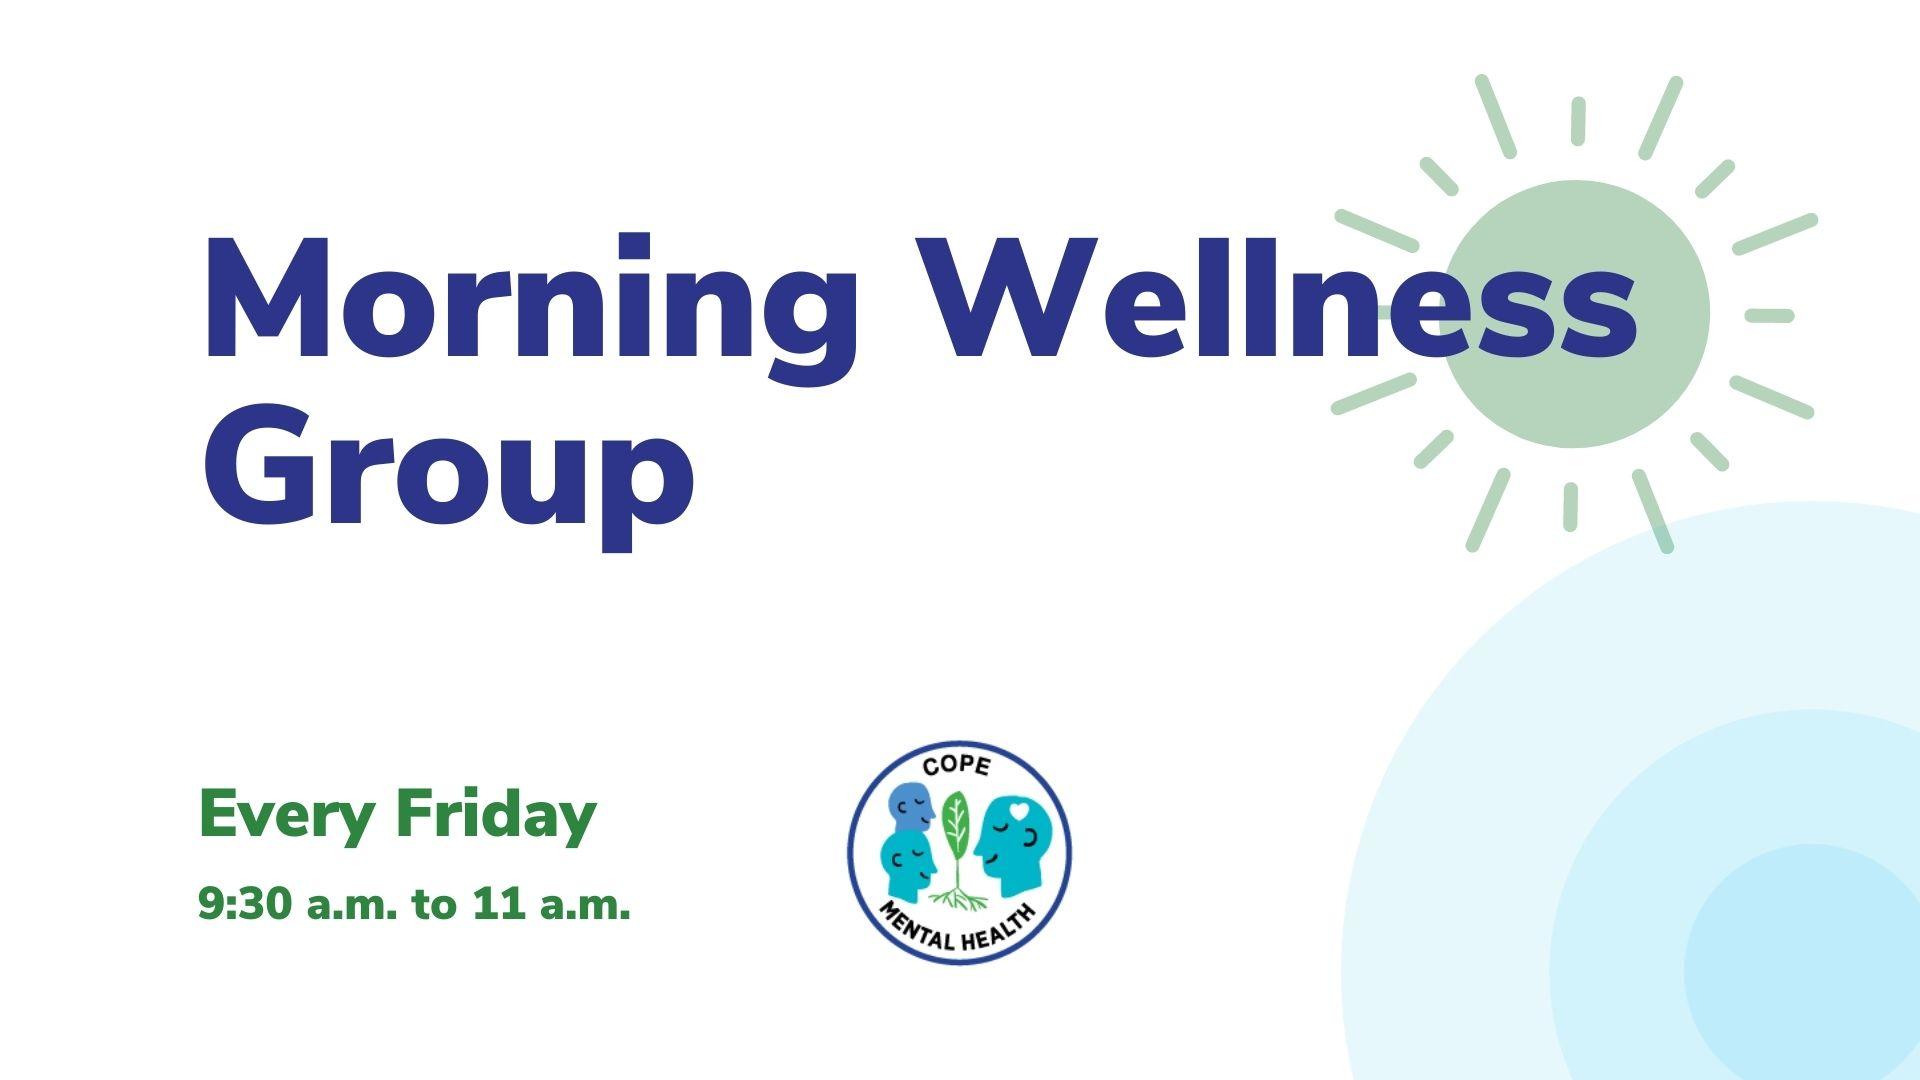 Morning Wellness Group